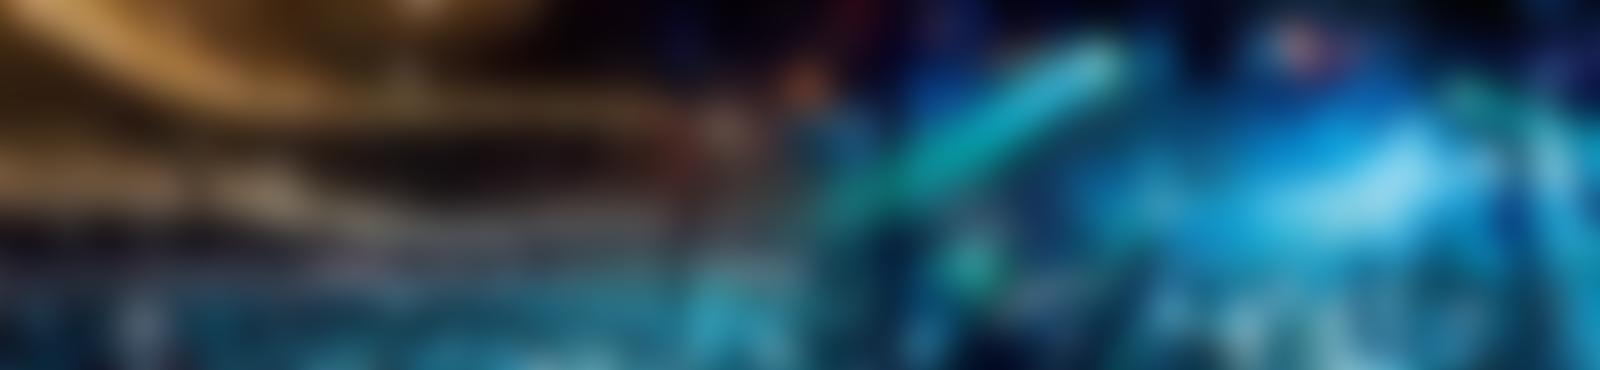 Blurred 90a86b5b fe8d 4494 a9f8 7d02c9699c4c